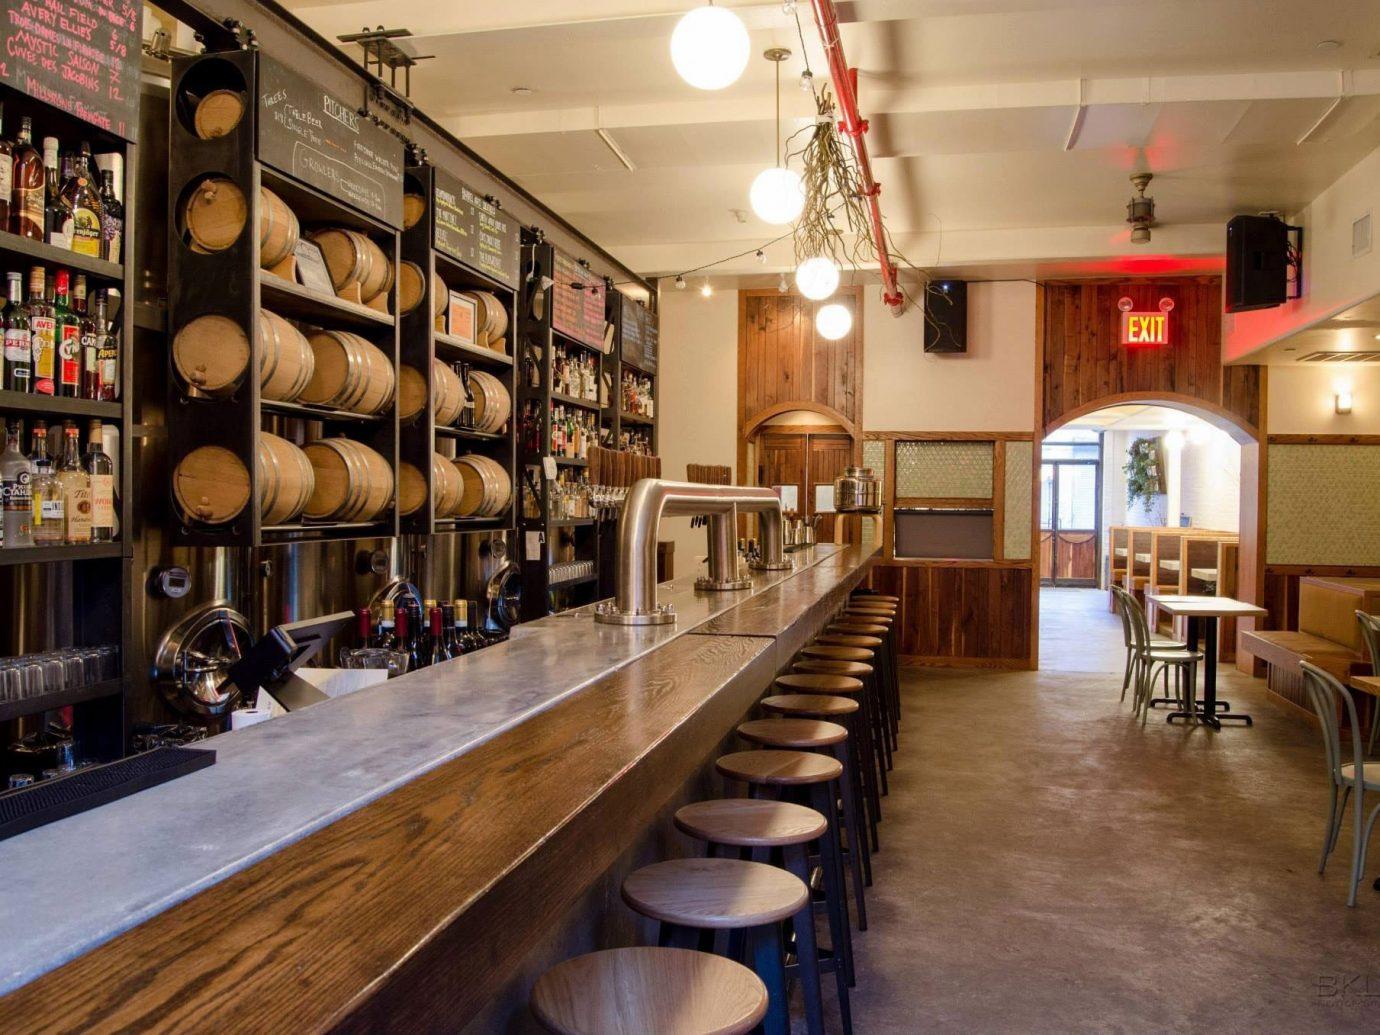 Food + Drink indoor floor Living room ceiling wood restaurant Bar café wooden interior design Dining furniture area dining room